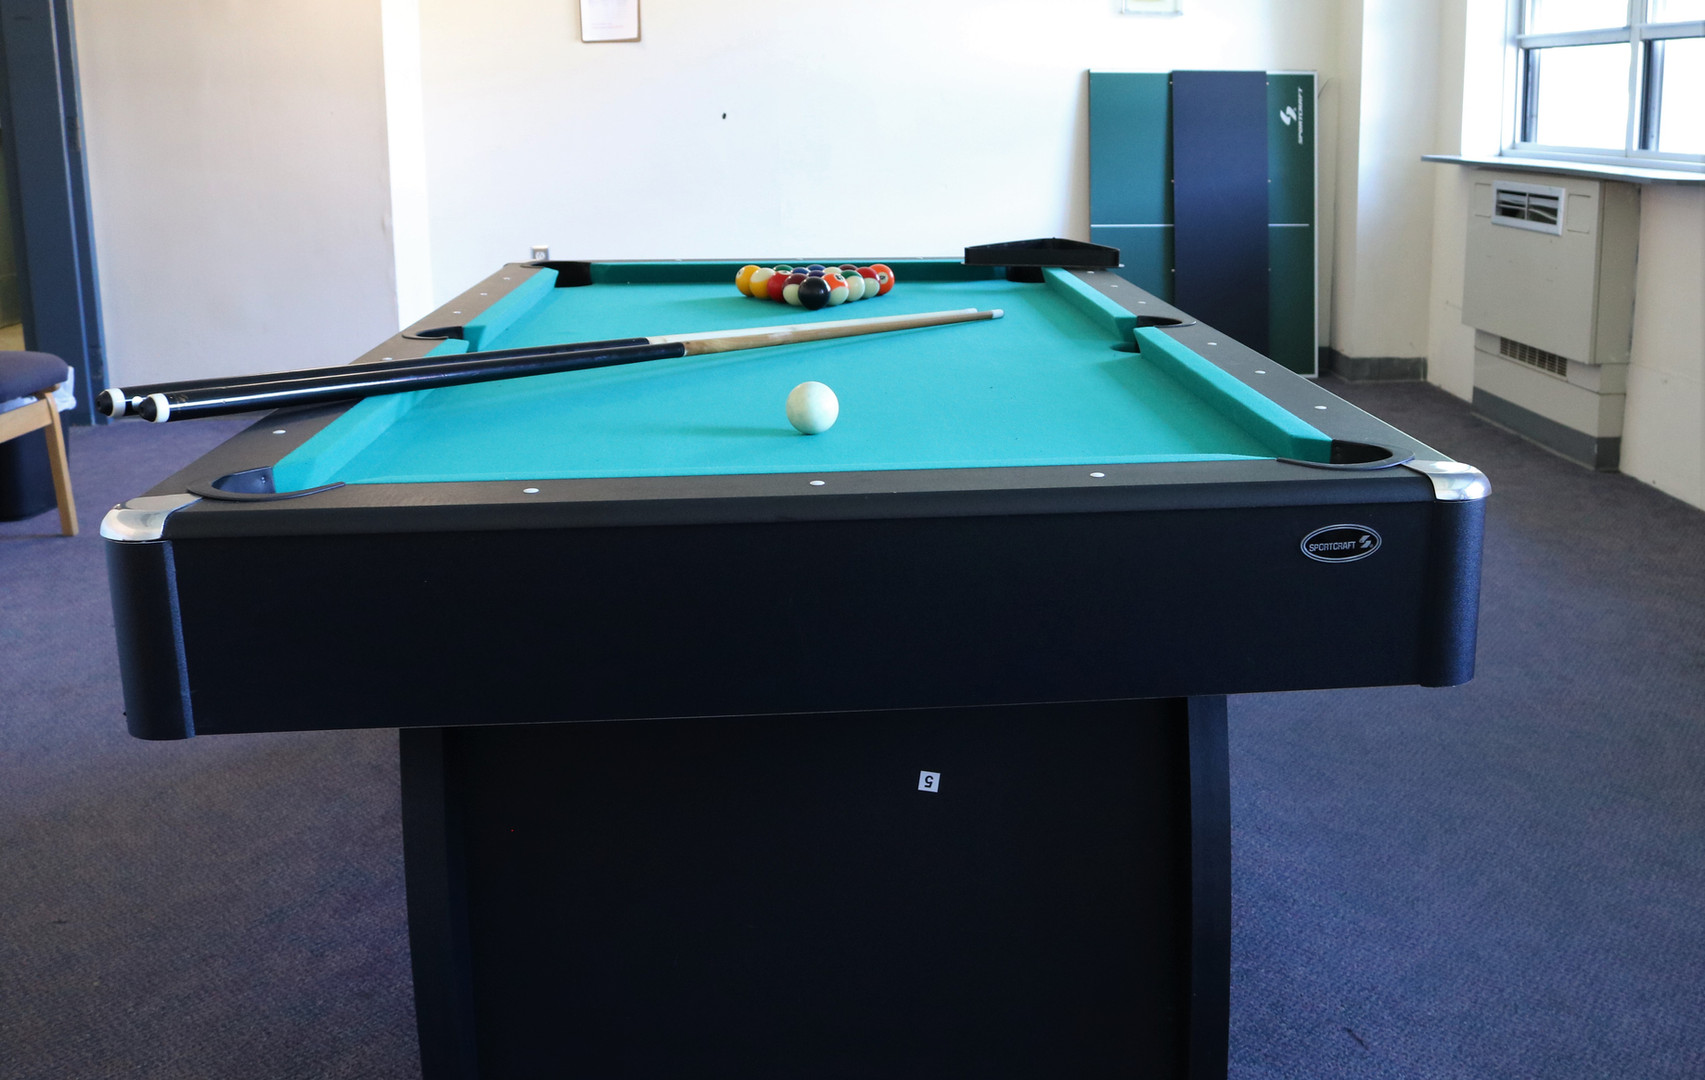 MHAB Game Room